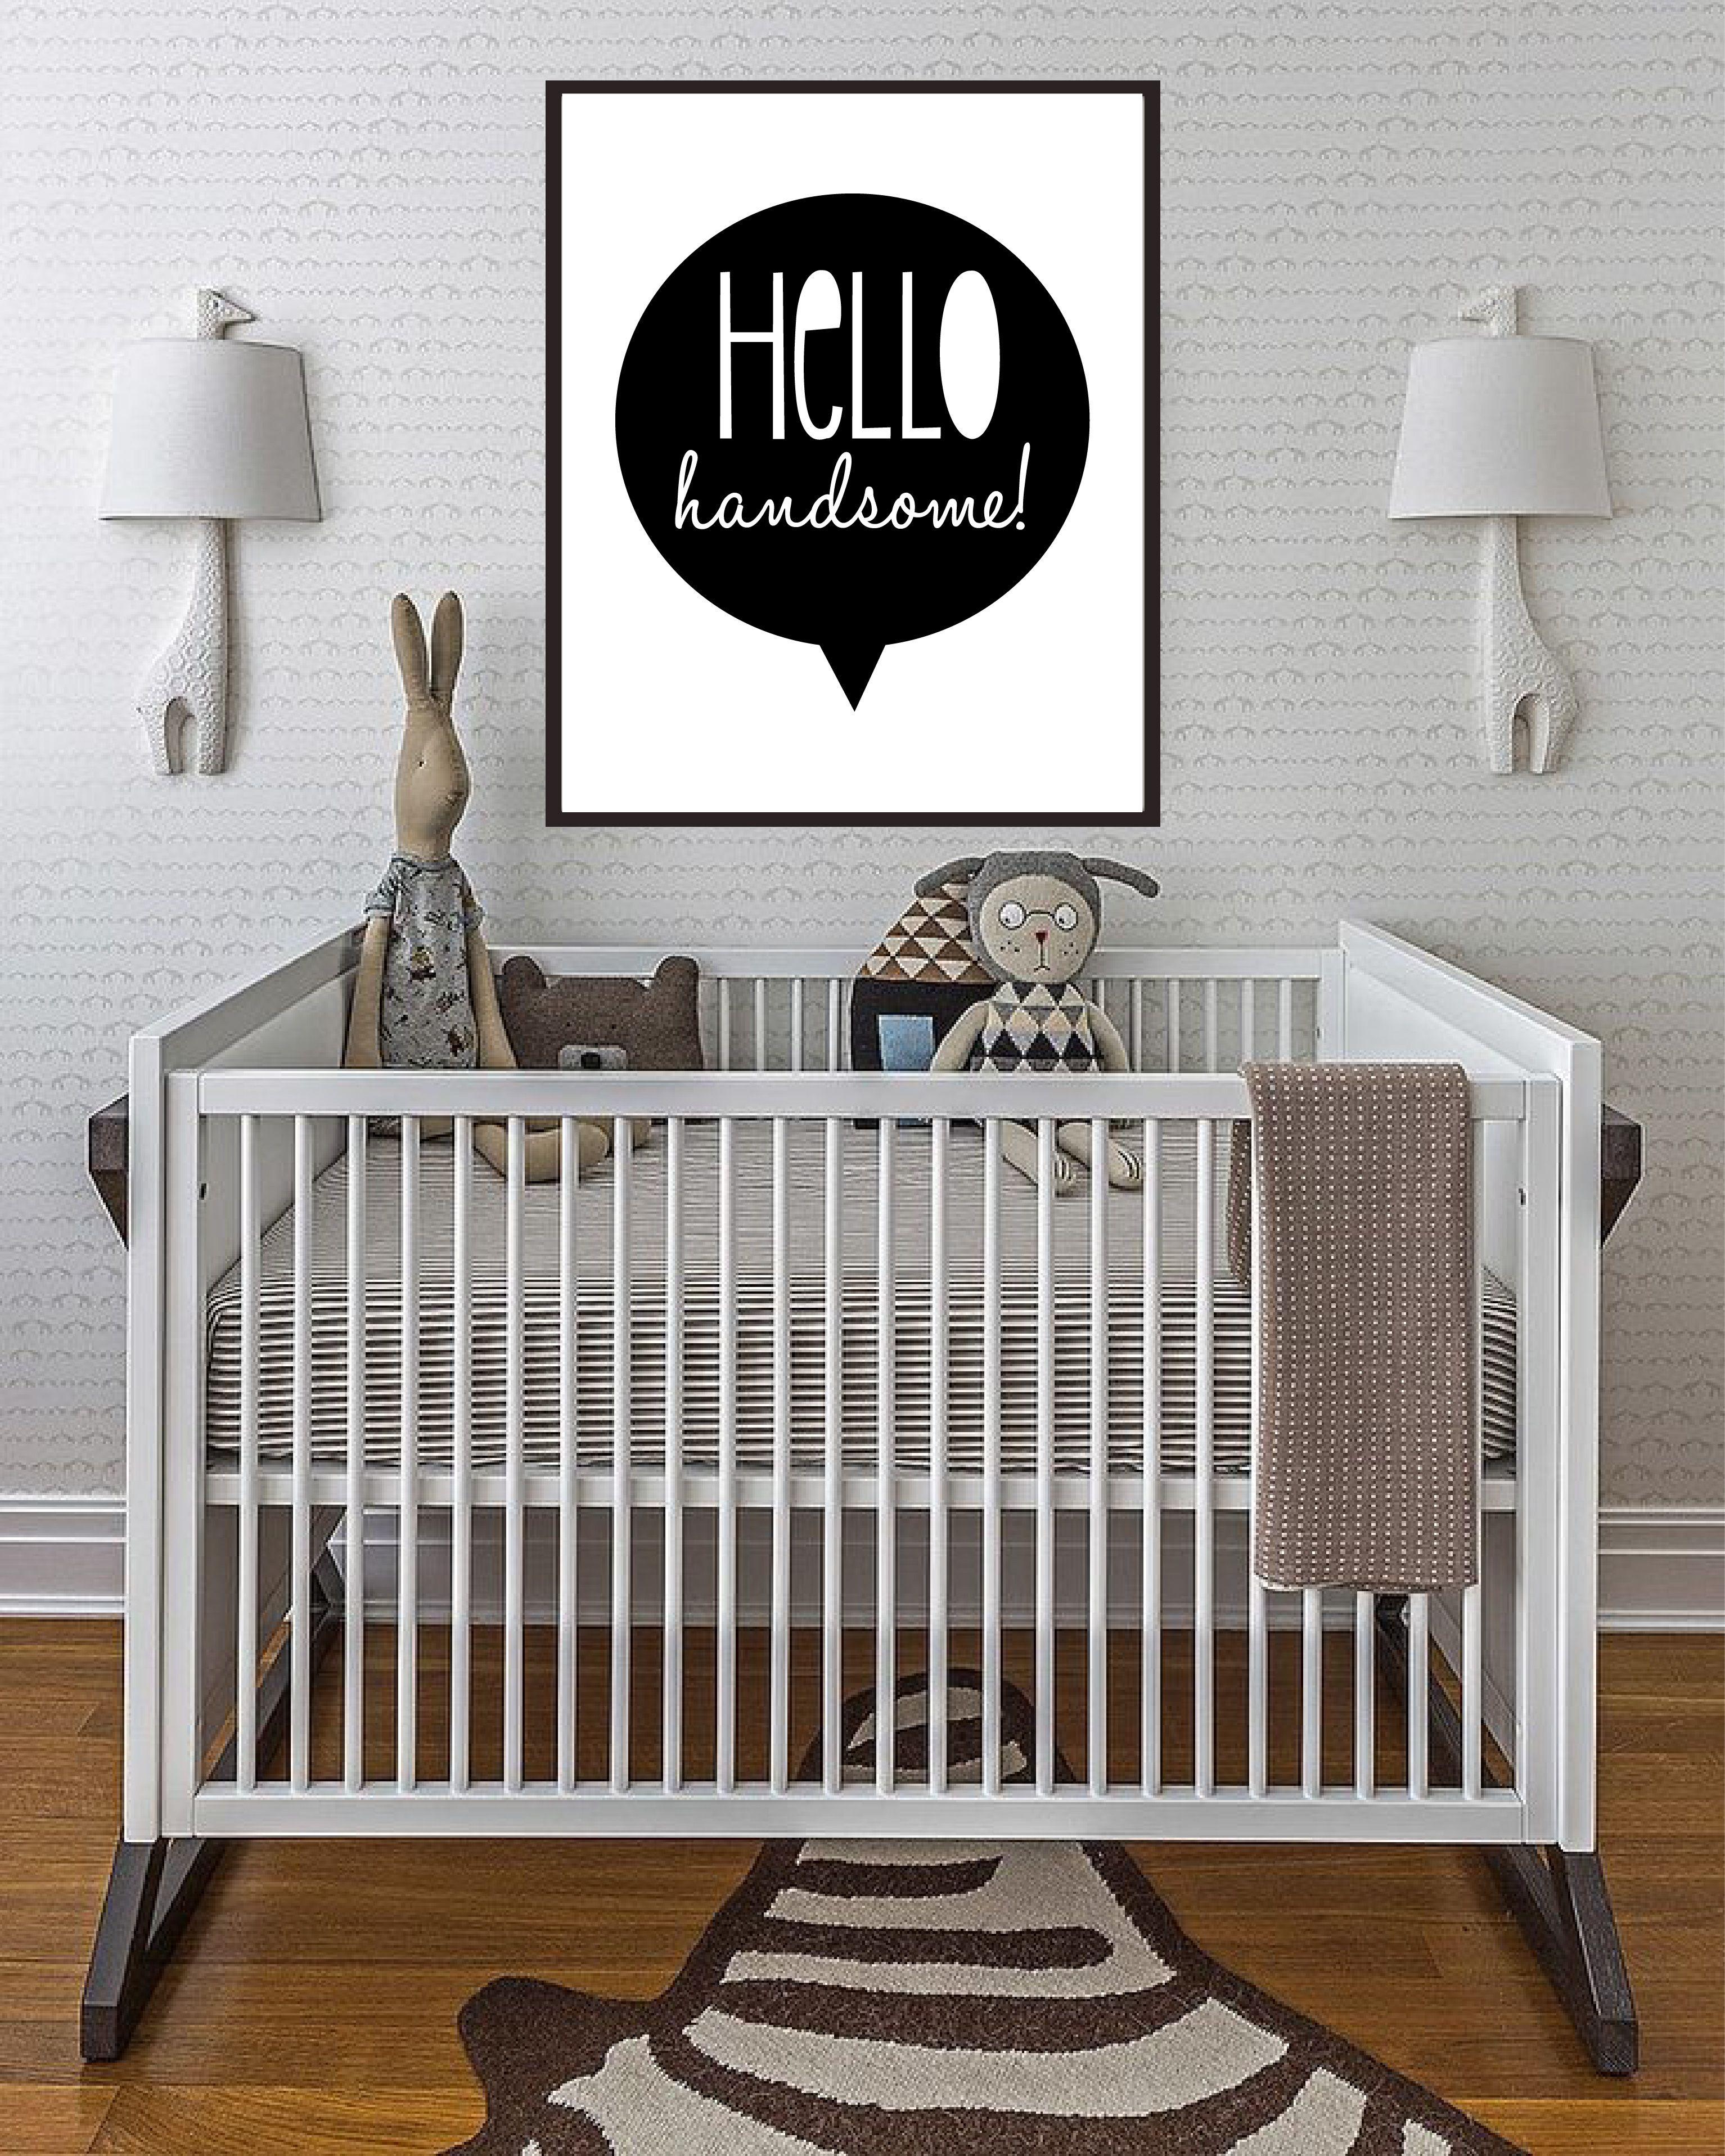 pinterest shipping jonathan inspiration best girl free adler on baby room elephant images lamp sweetmelodydesi nursery